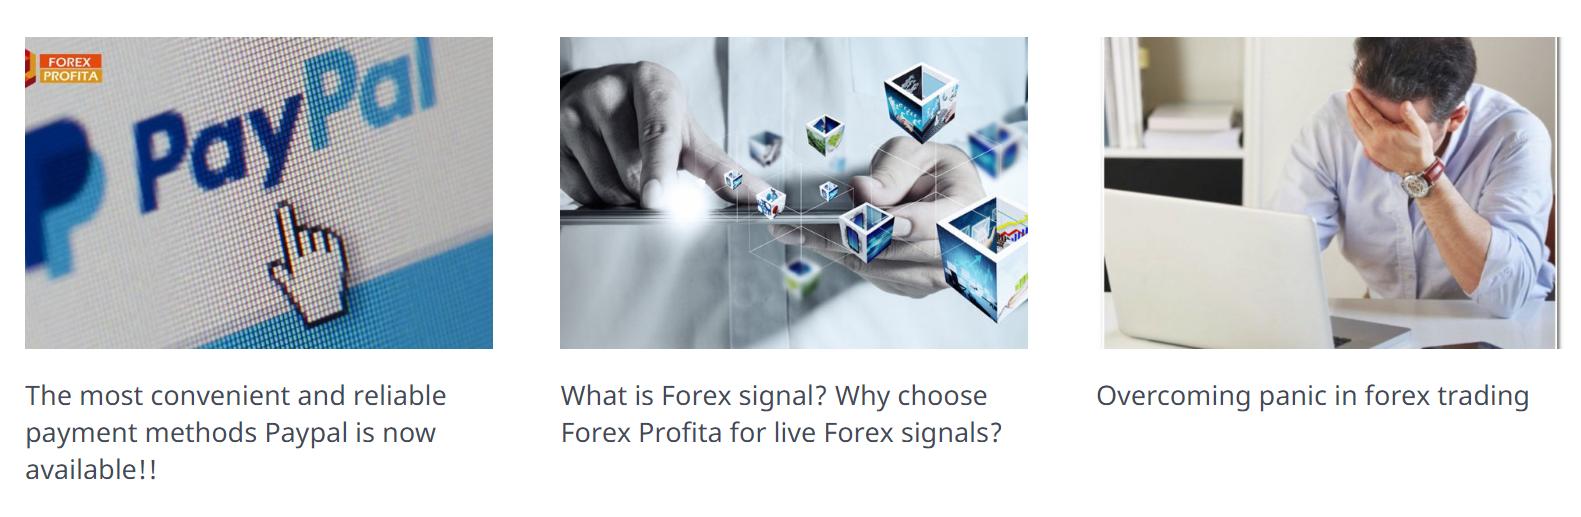 Forex Profita blog